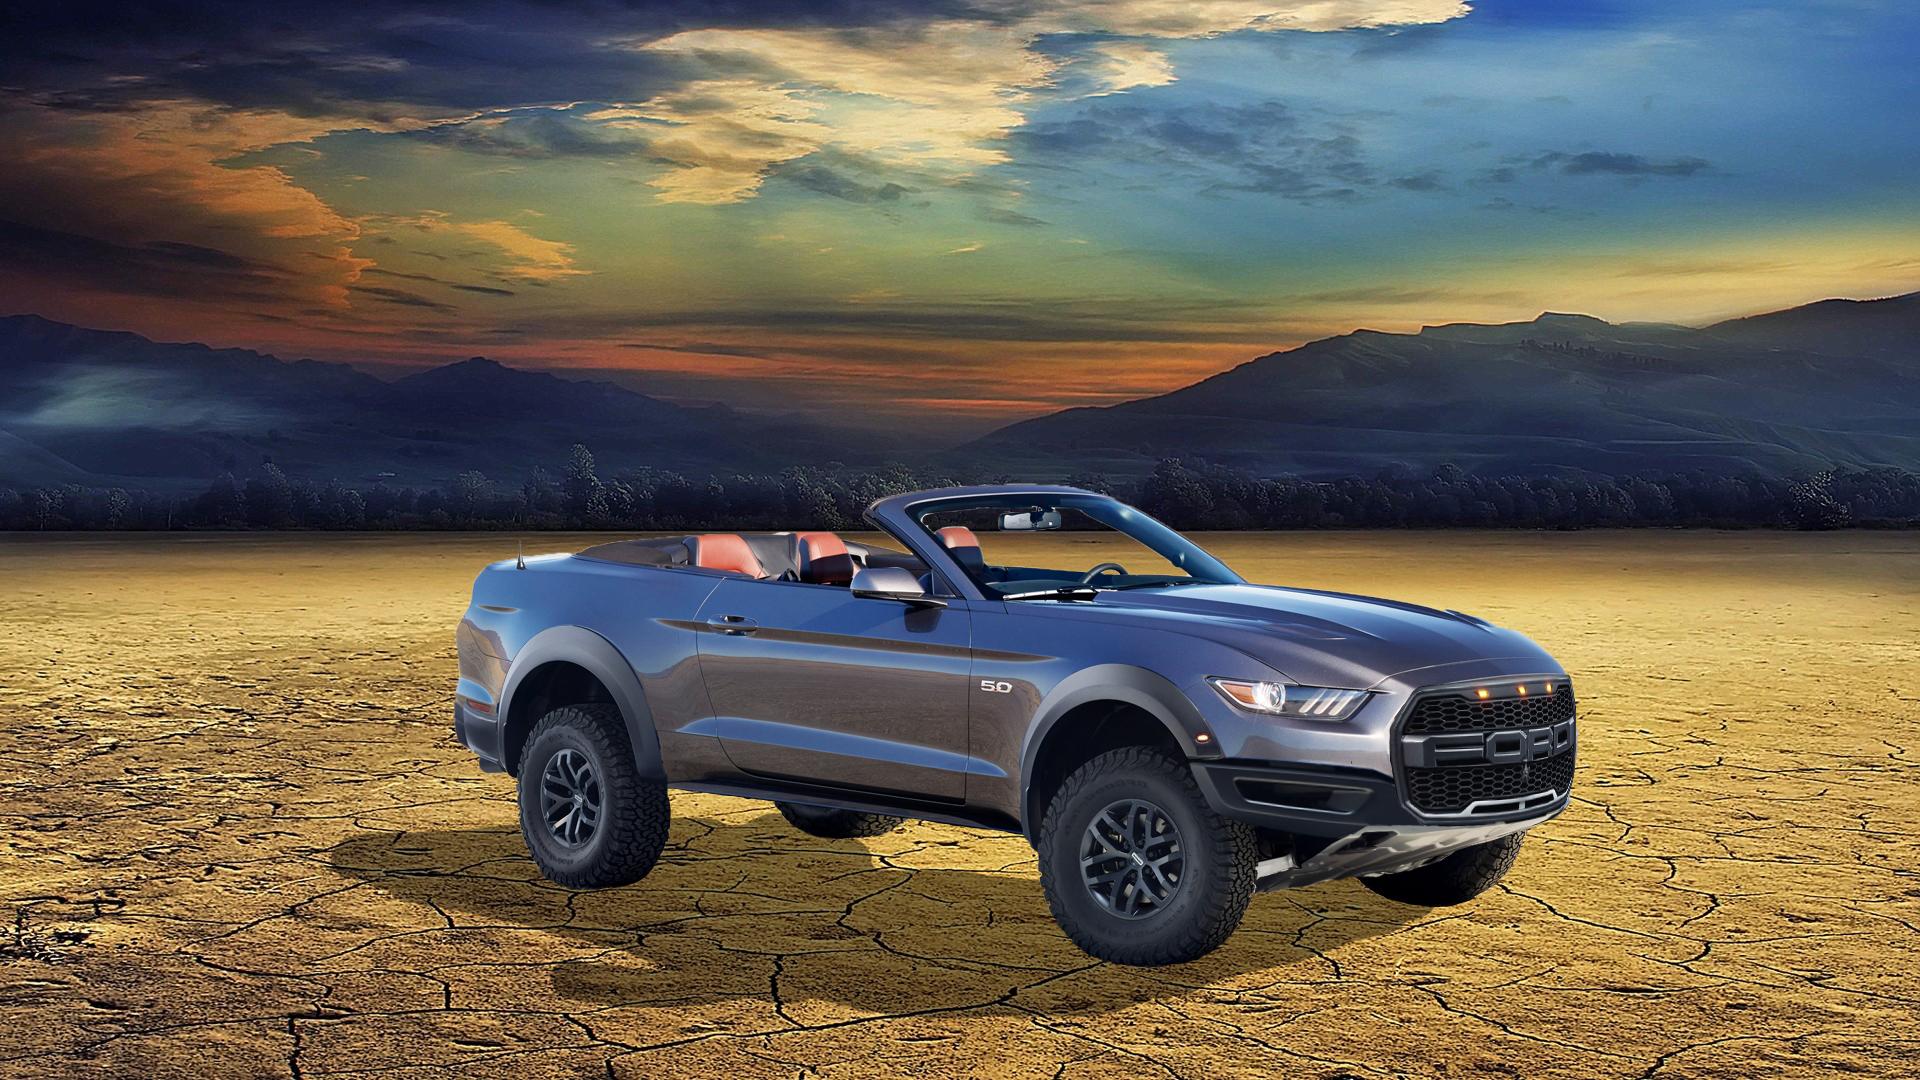 The Mustang Raptor